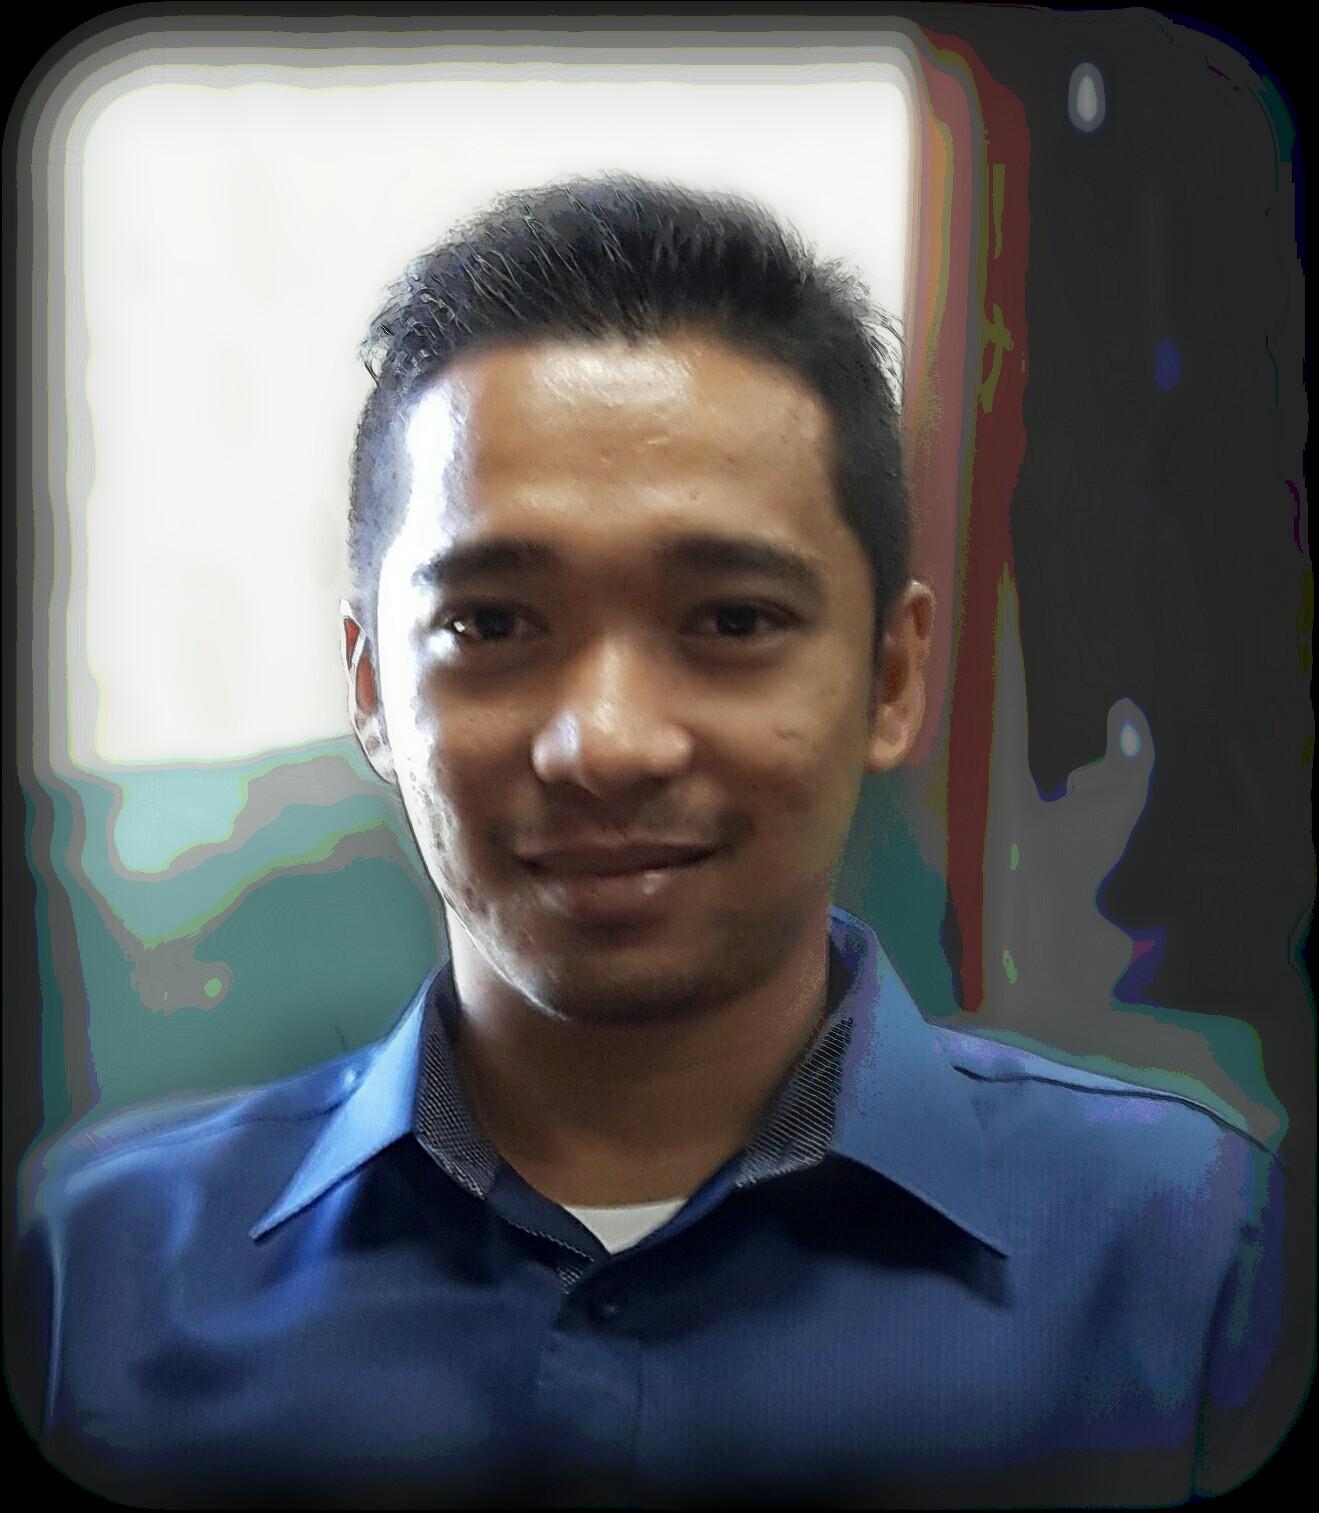 Mohd Najmudeen b. Salleh